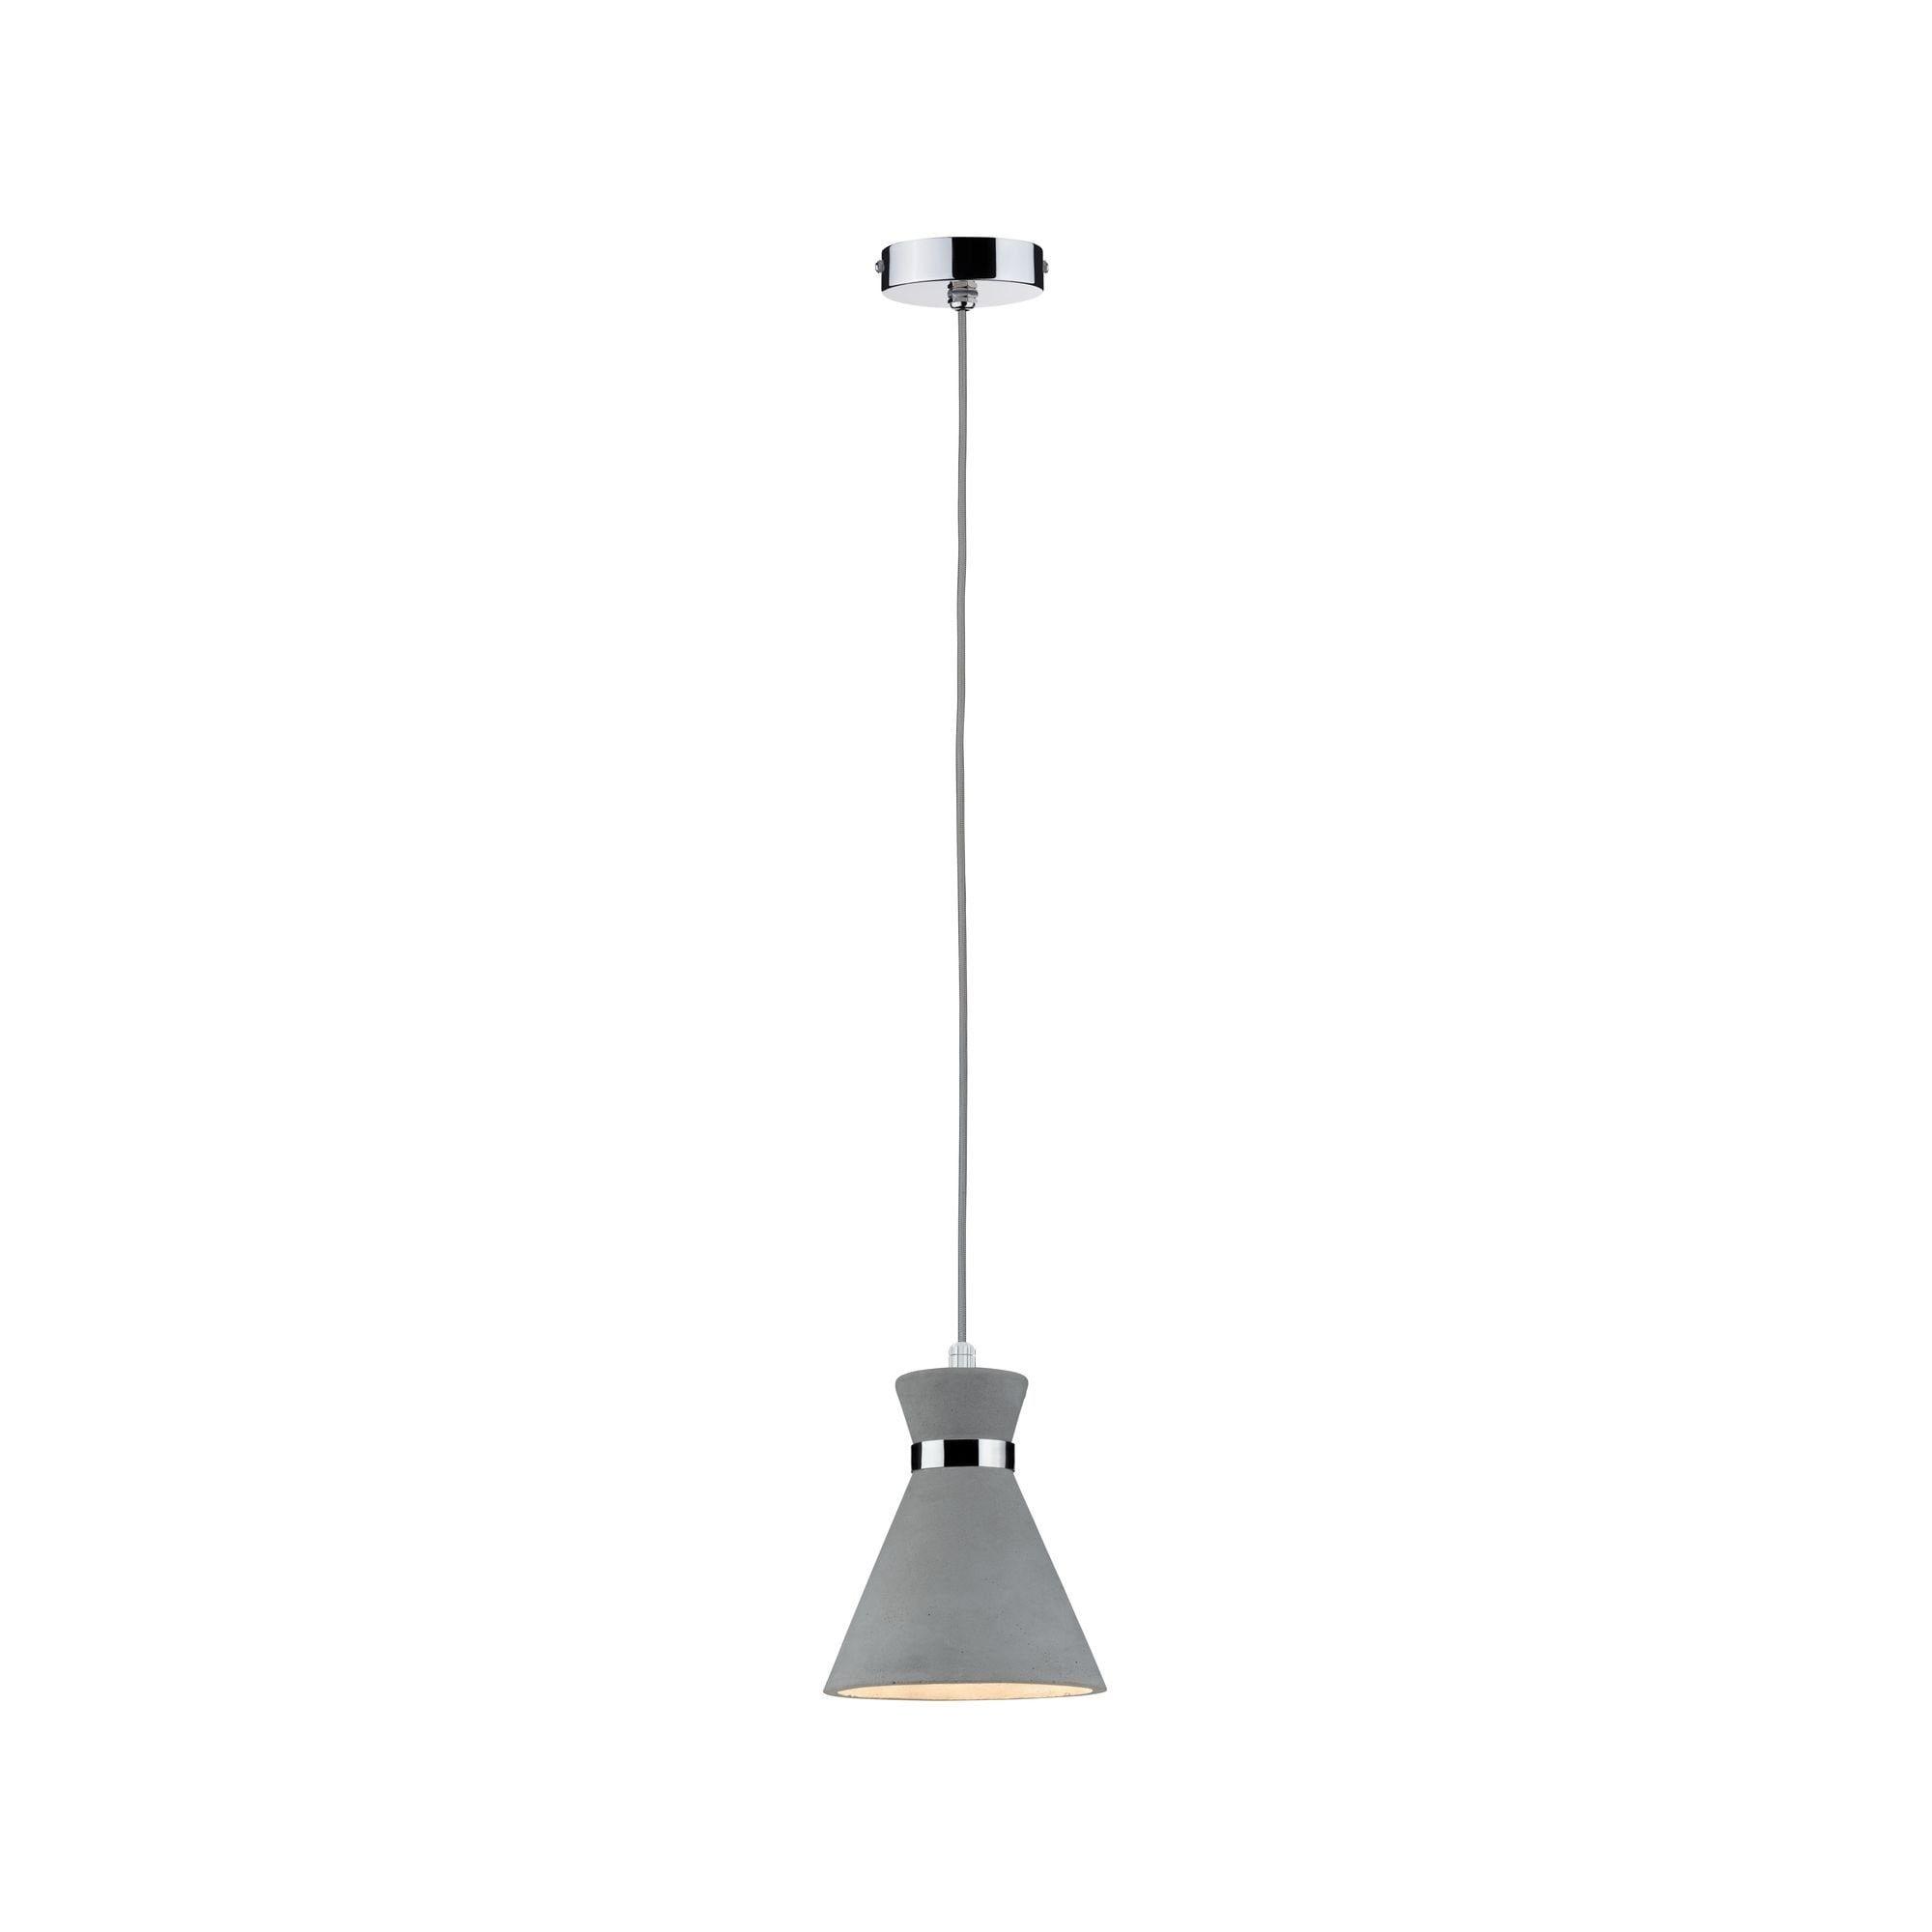 Paulmann LED Pendelleuchte Verve Beton/Chrom max. 20W E27, E27, 1 St.